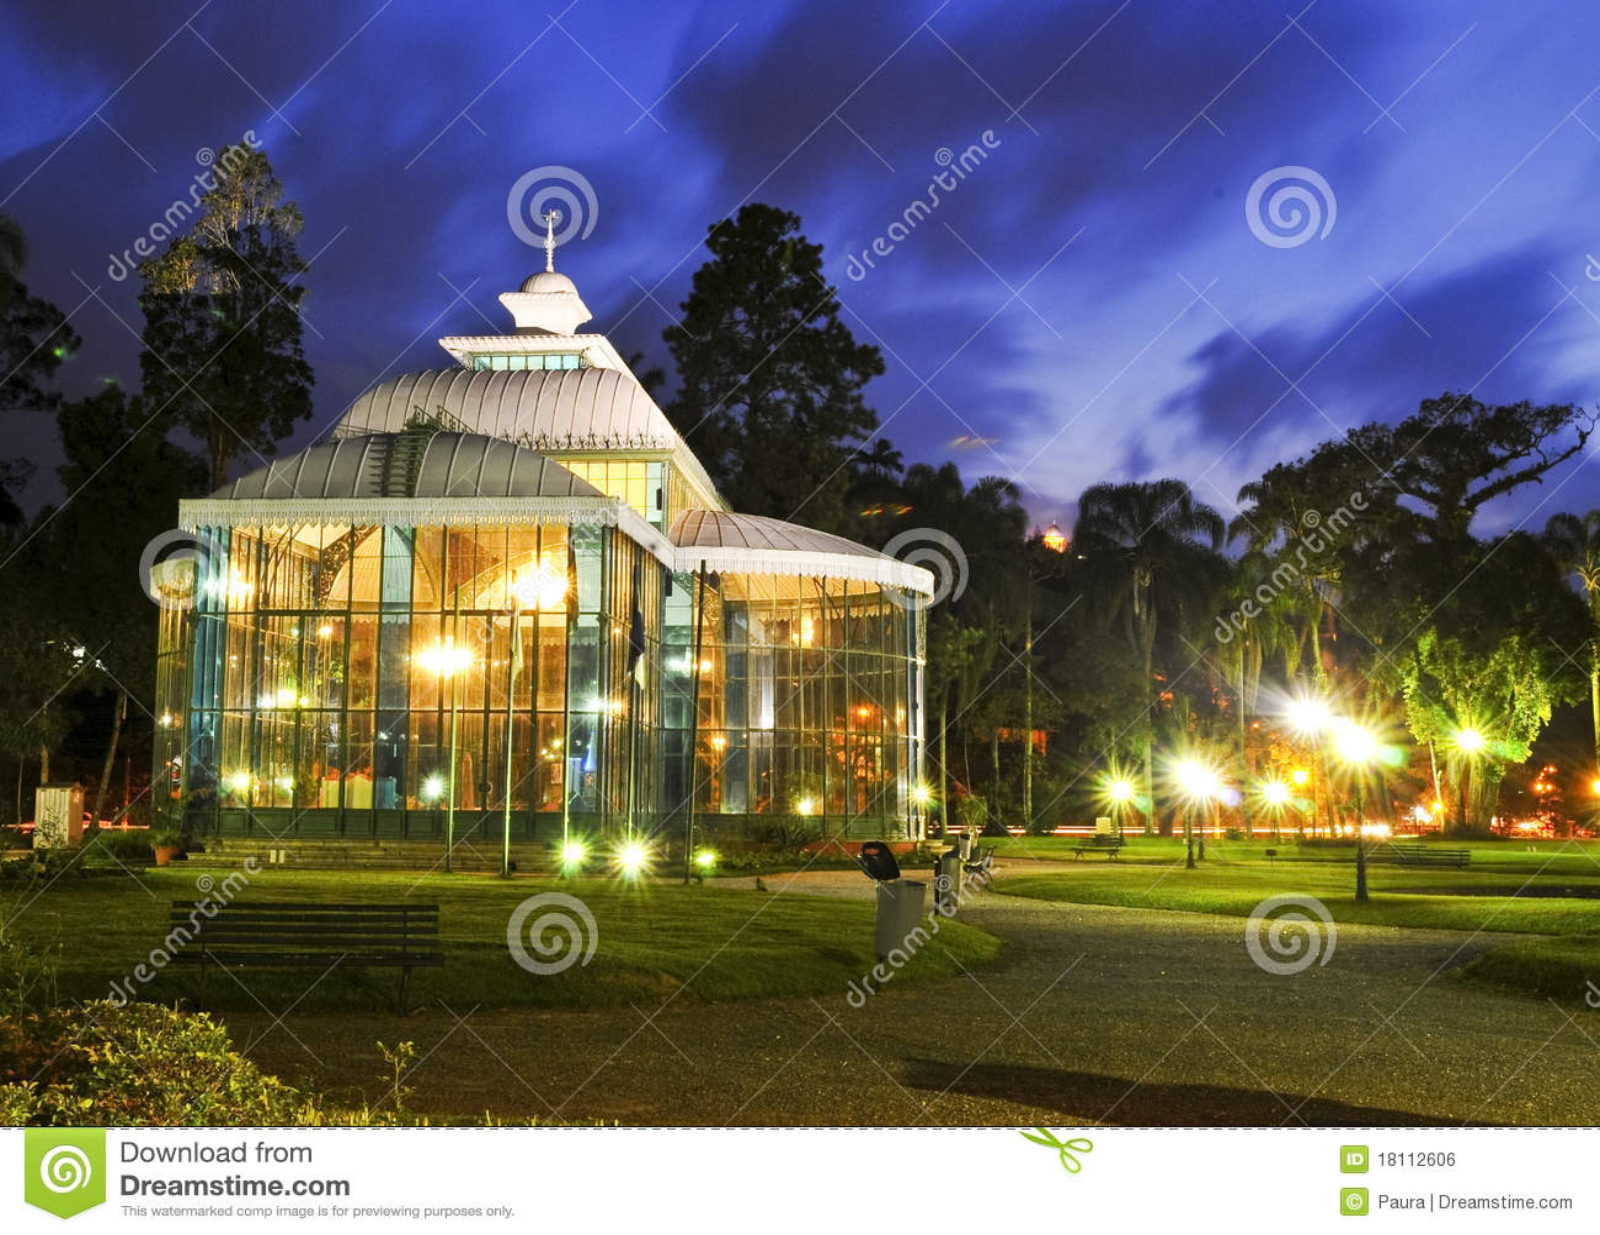 Palácio de Cristal de Petropolis